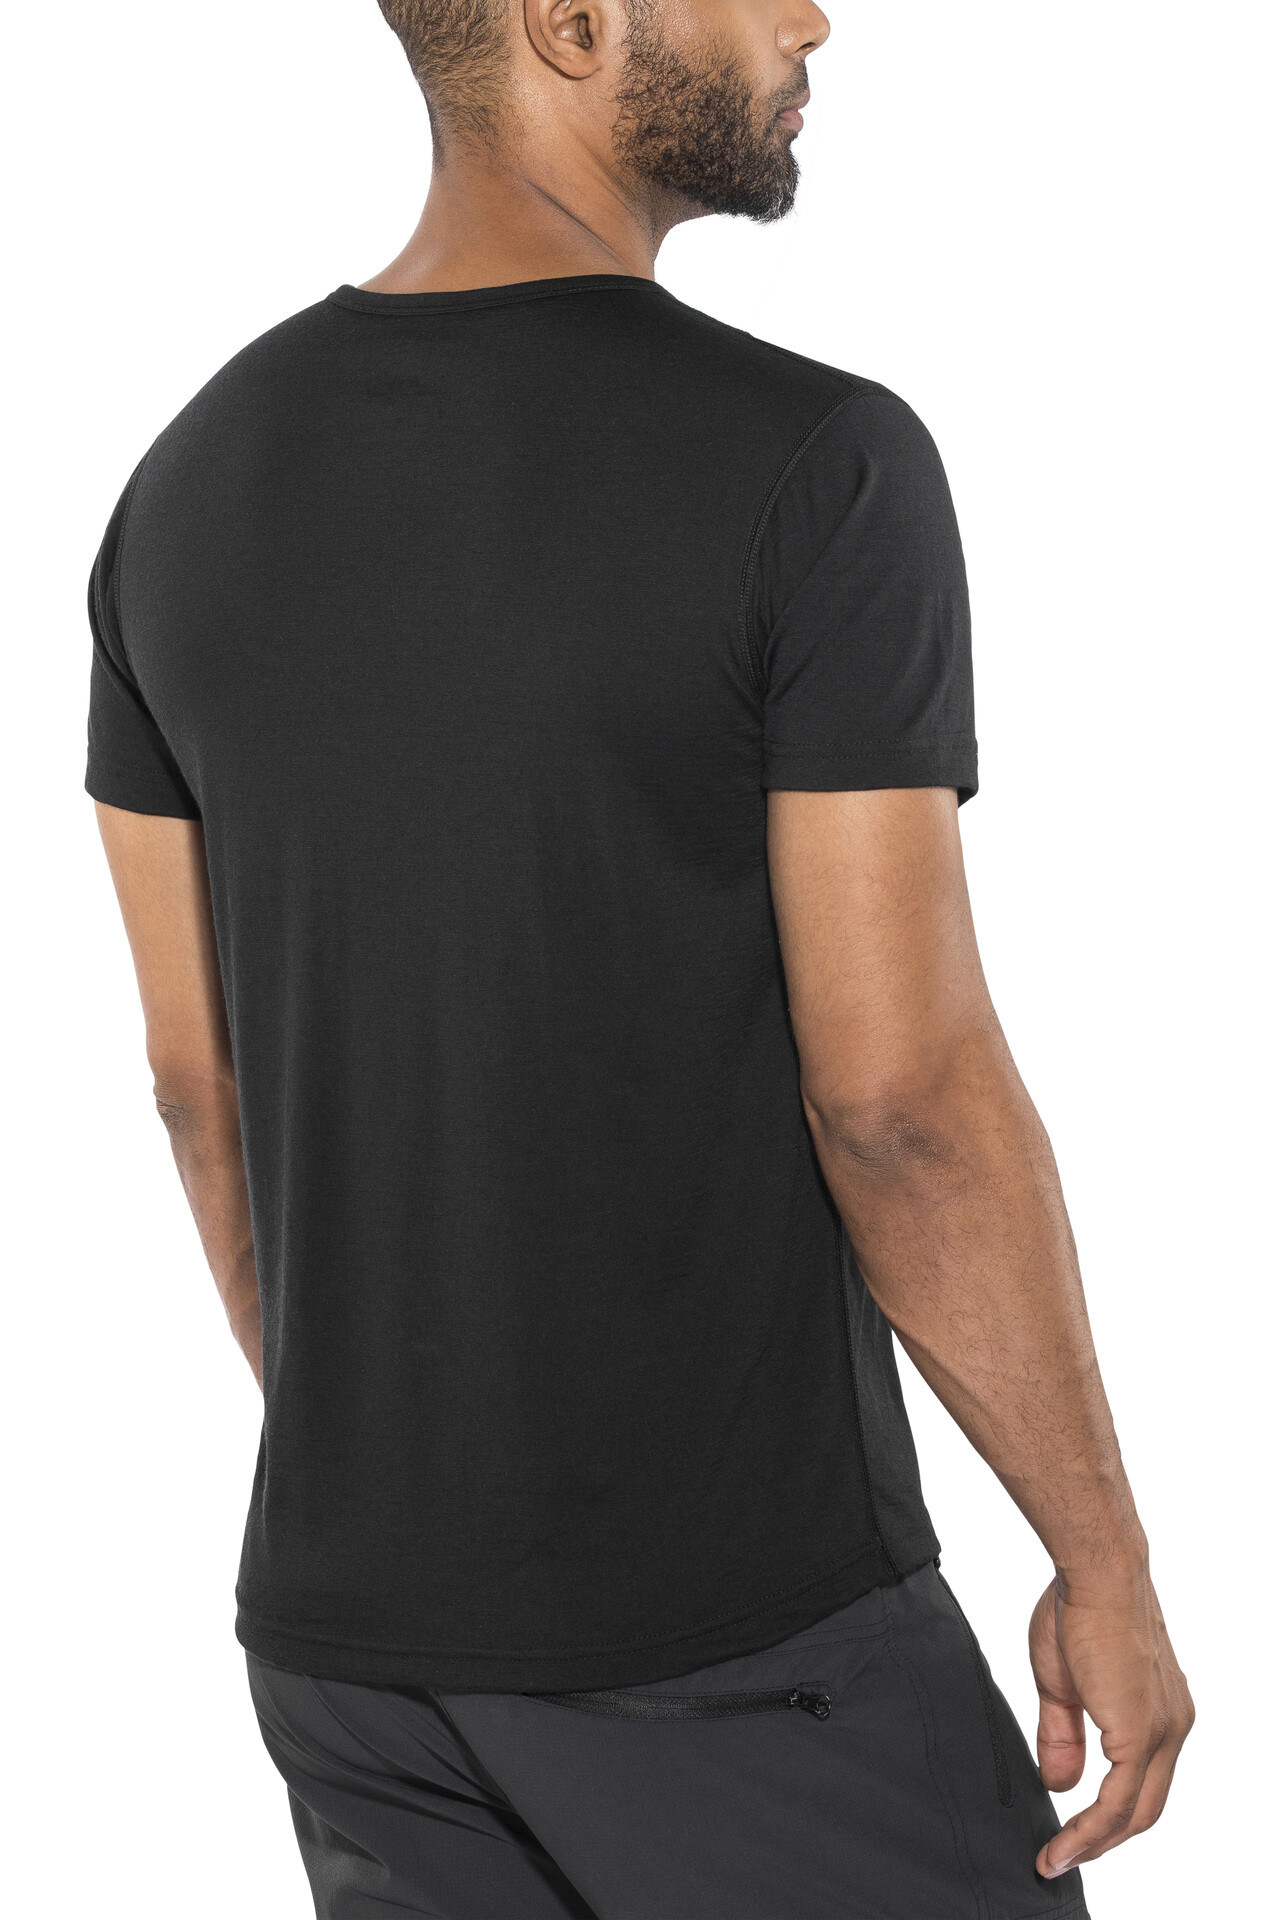 Devold Herdal Subsea 2019 Camiseta de manga corta para hombre